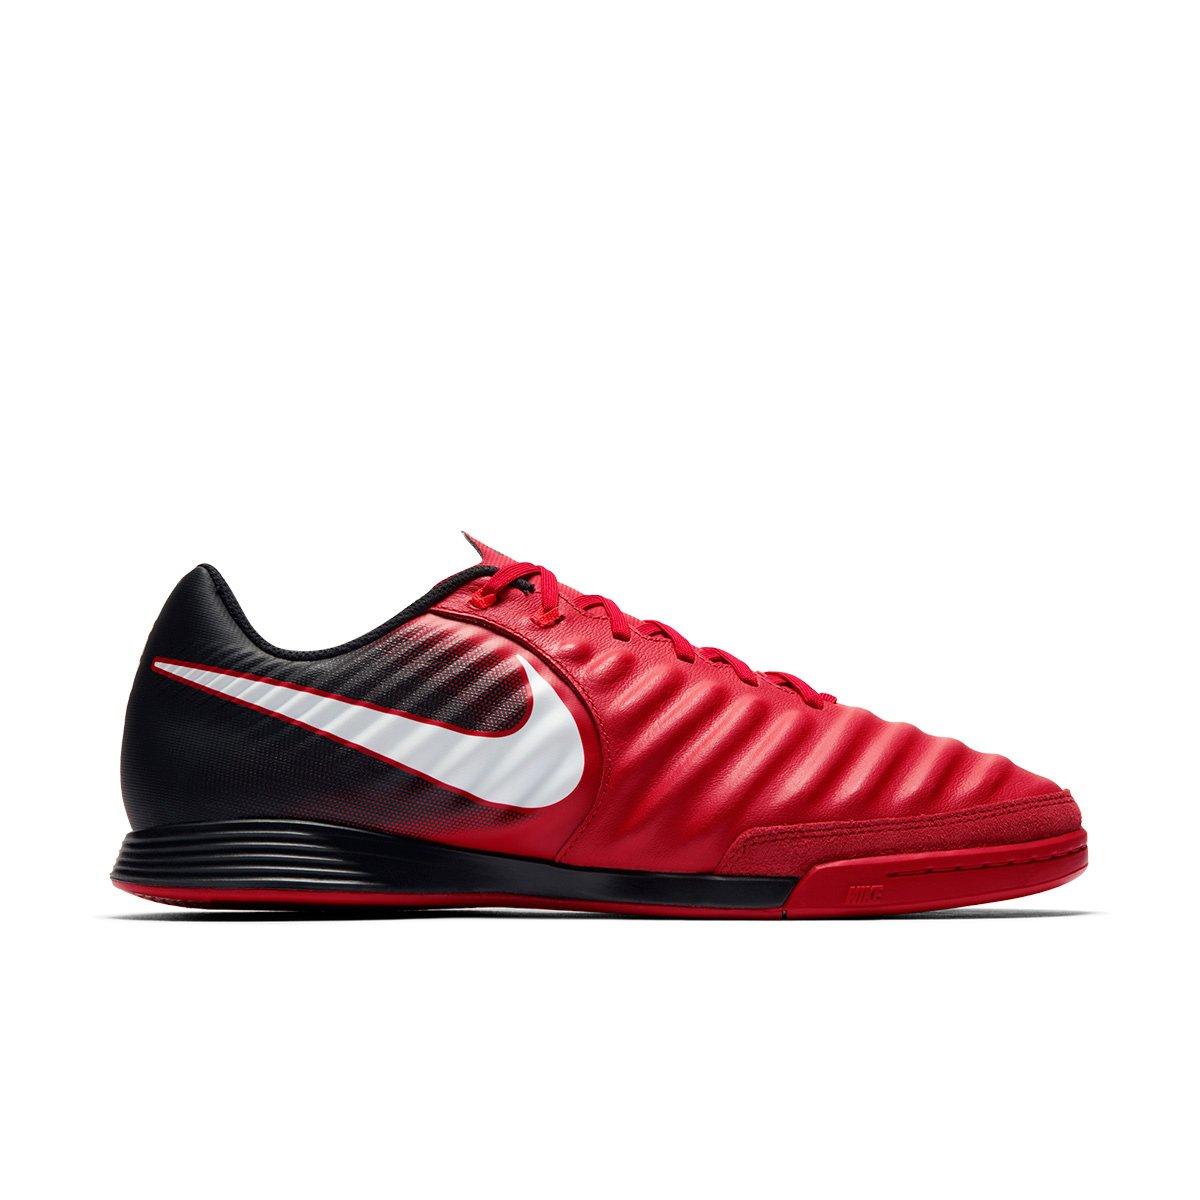 c0ec715028 Chuteira Futsal Nike Tiempo Ligera 4 IC - Compre Agora